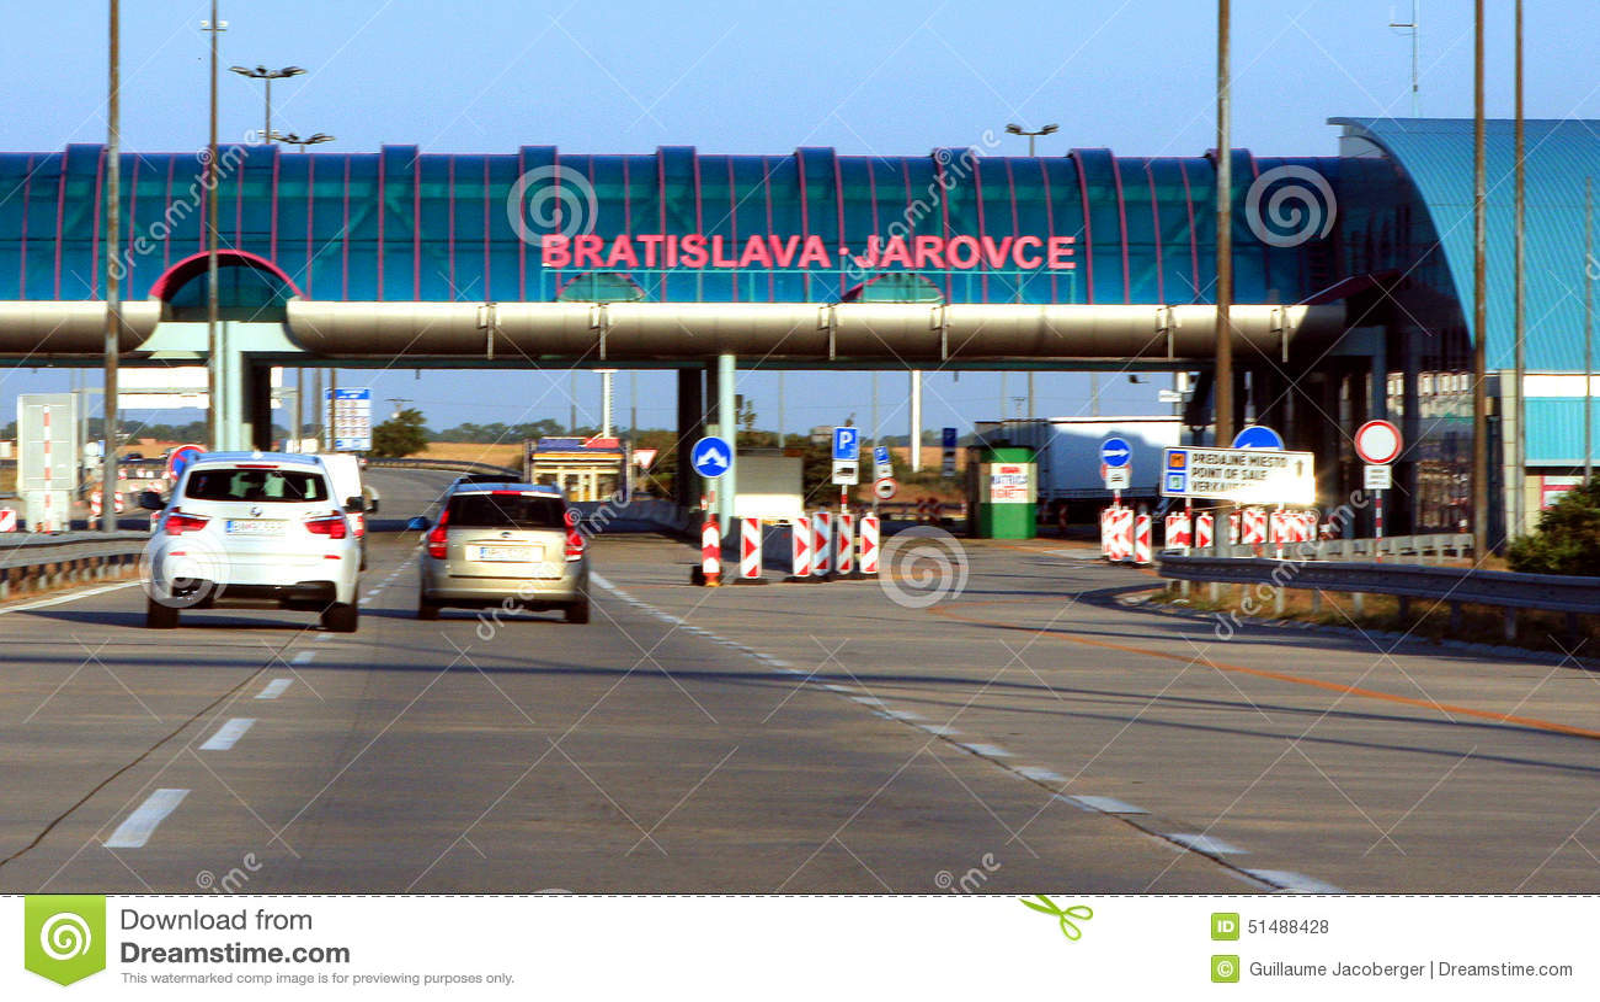 espaces-transfrontaliers.org: Border factsheets |Slovakia Borders